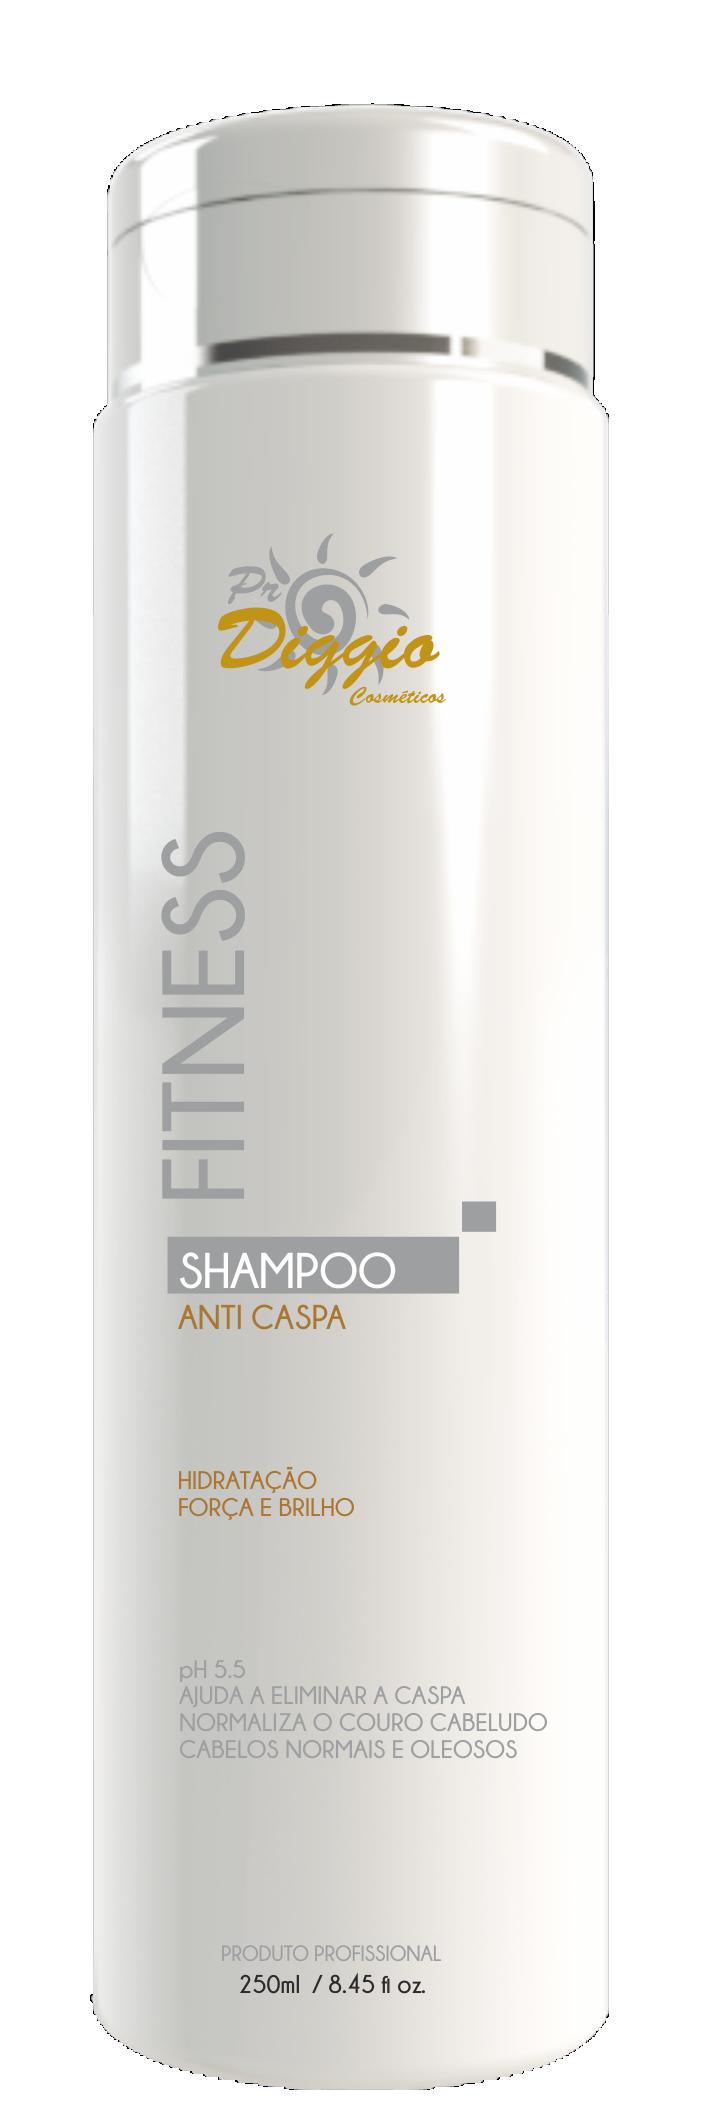 Anti Caspa Shampoo